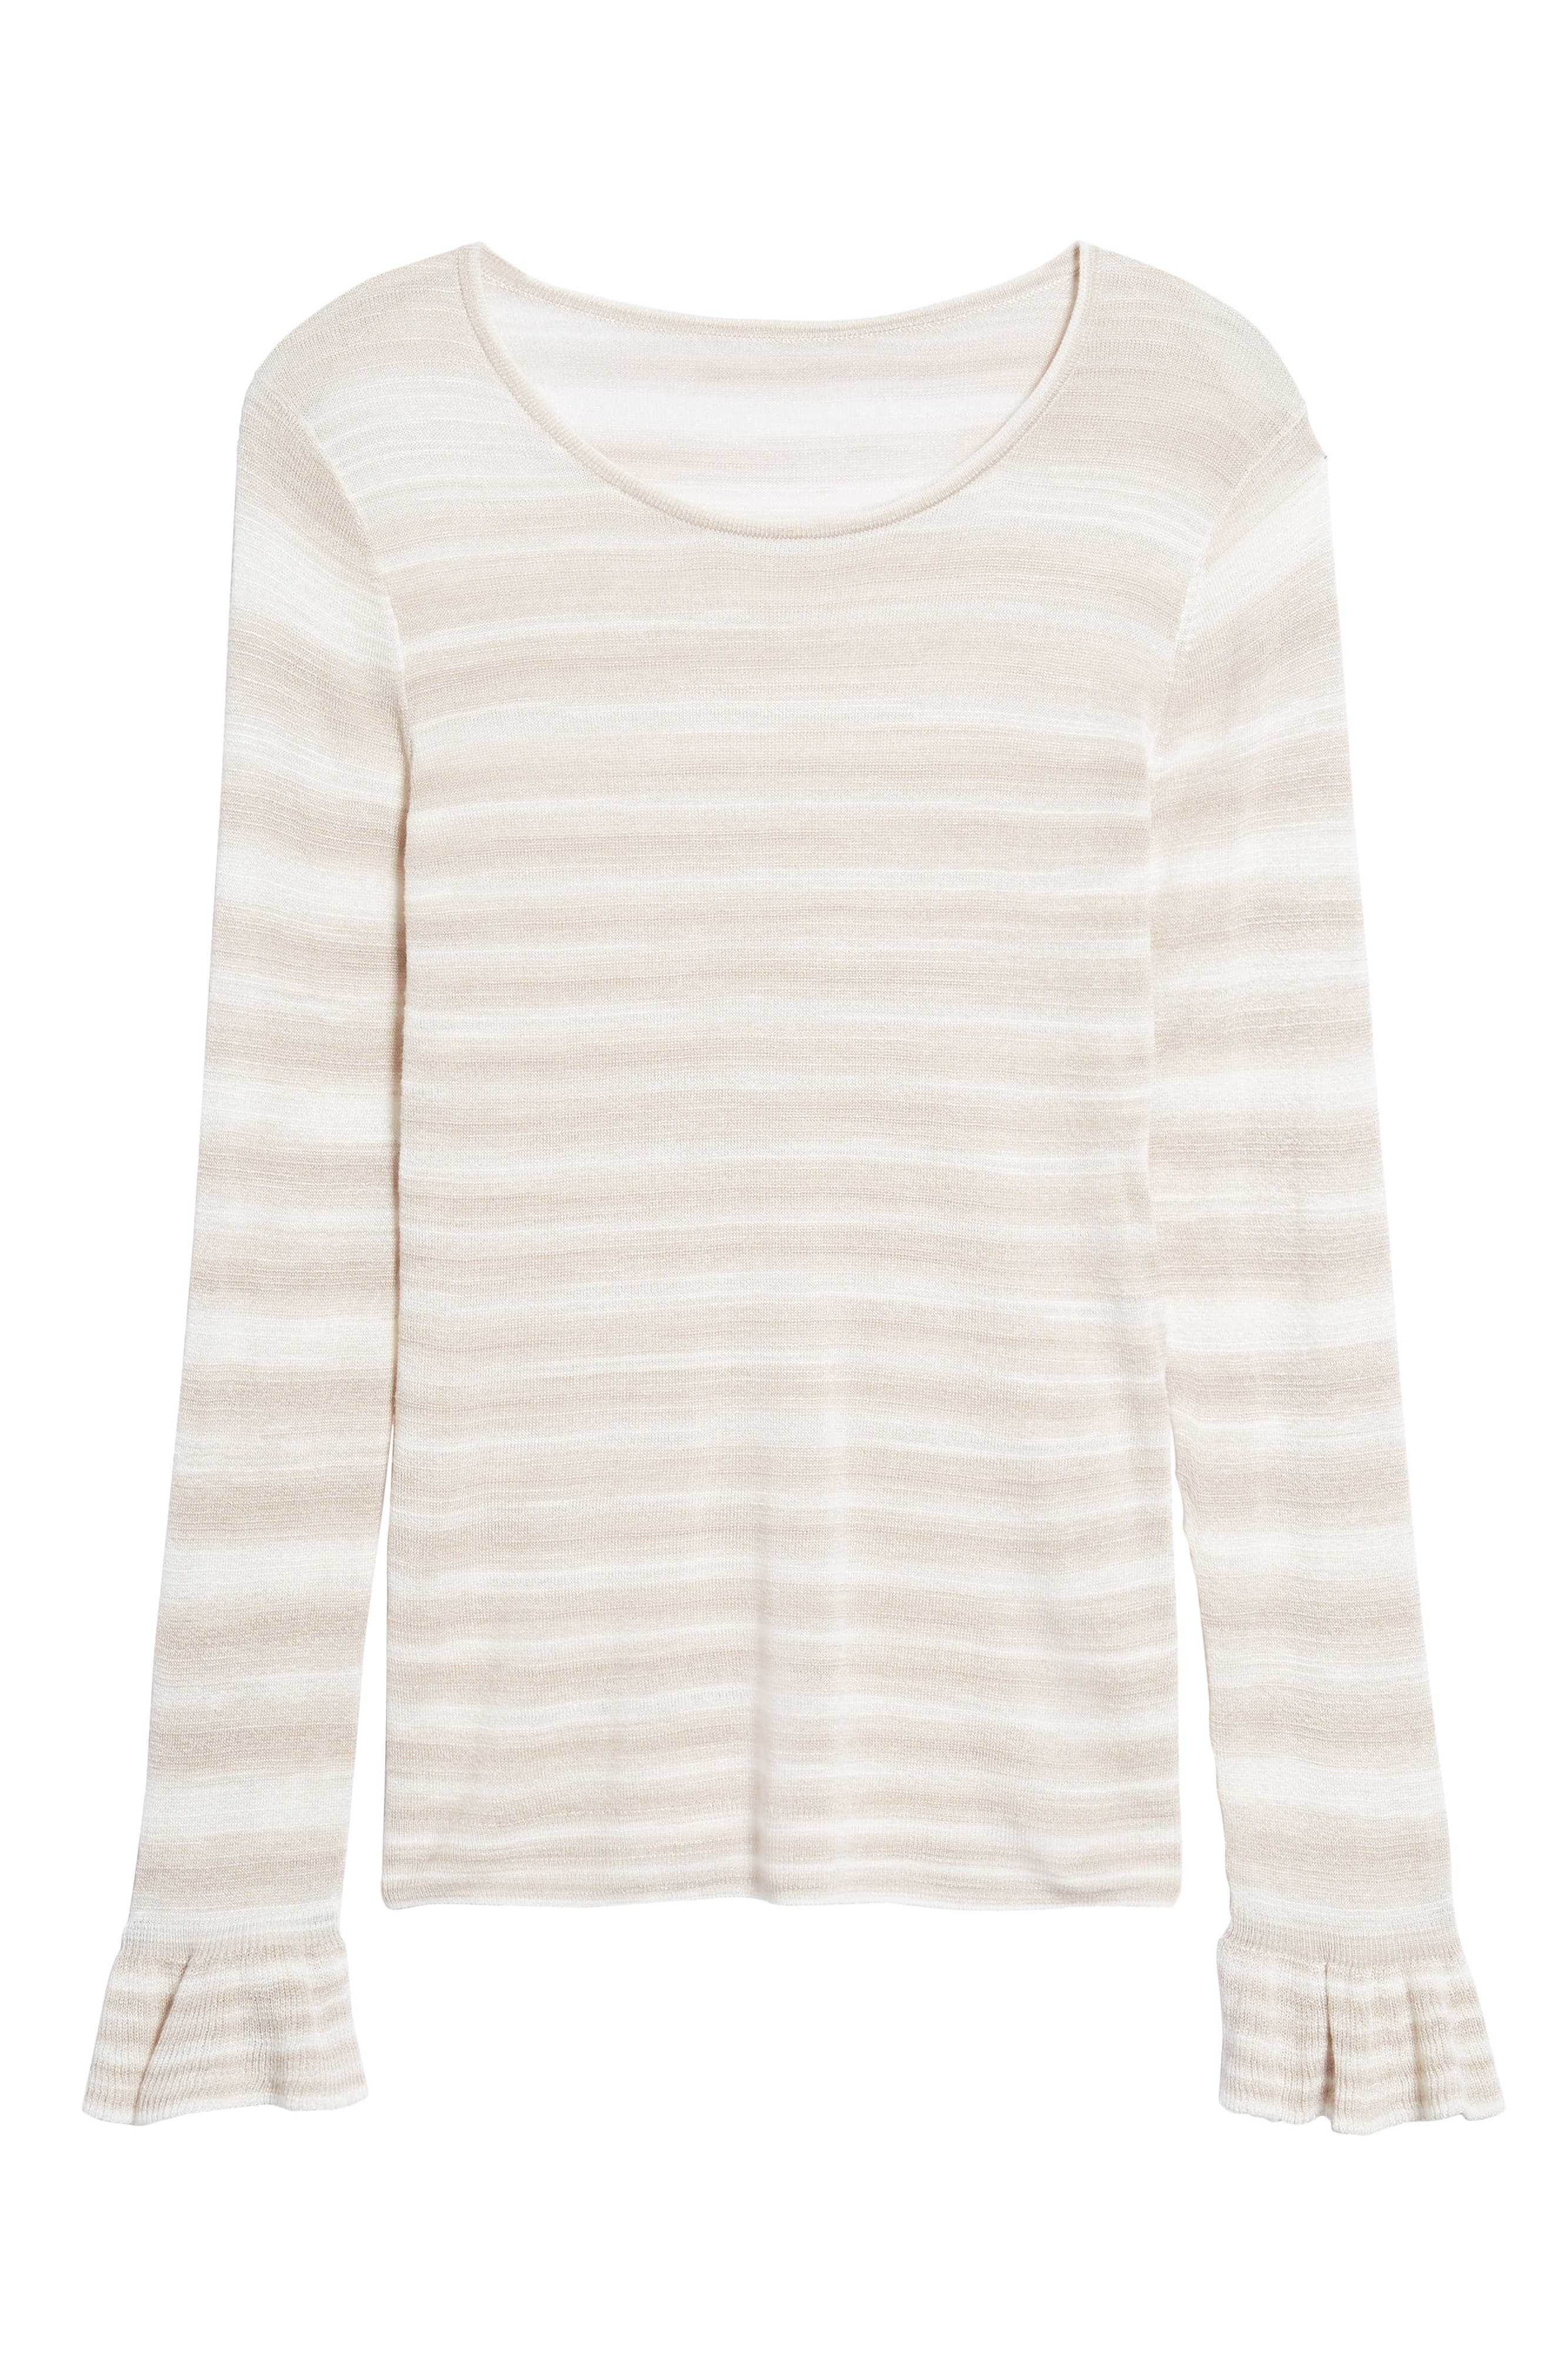 Gradient Stripe Sweater,                             Alternate thumbnail 6, color,                             250